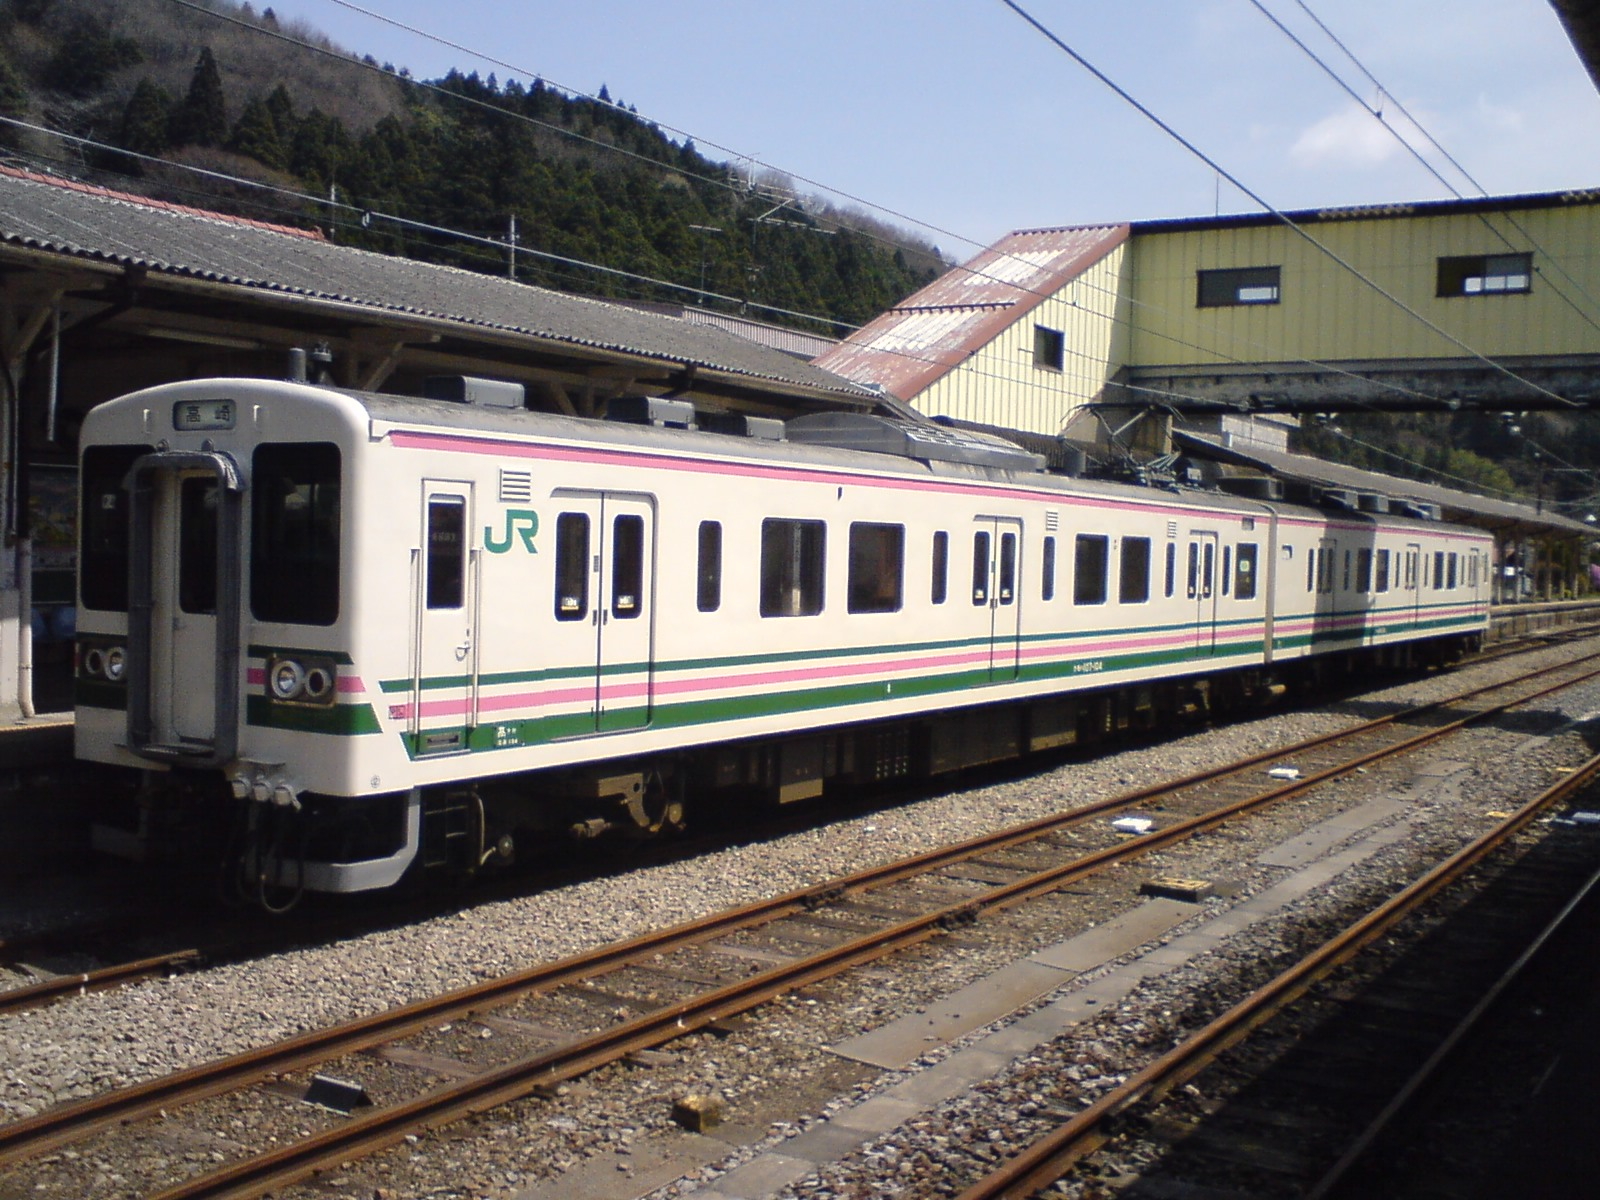 Kc380014